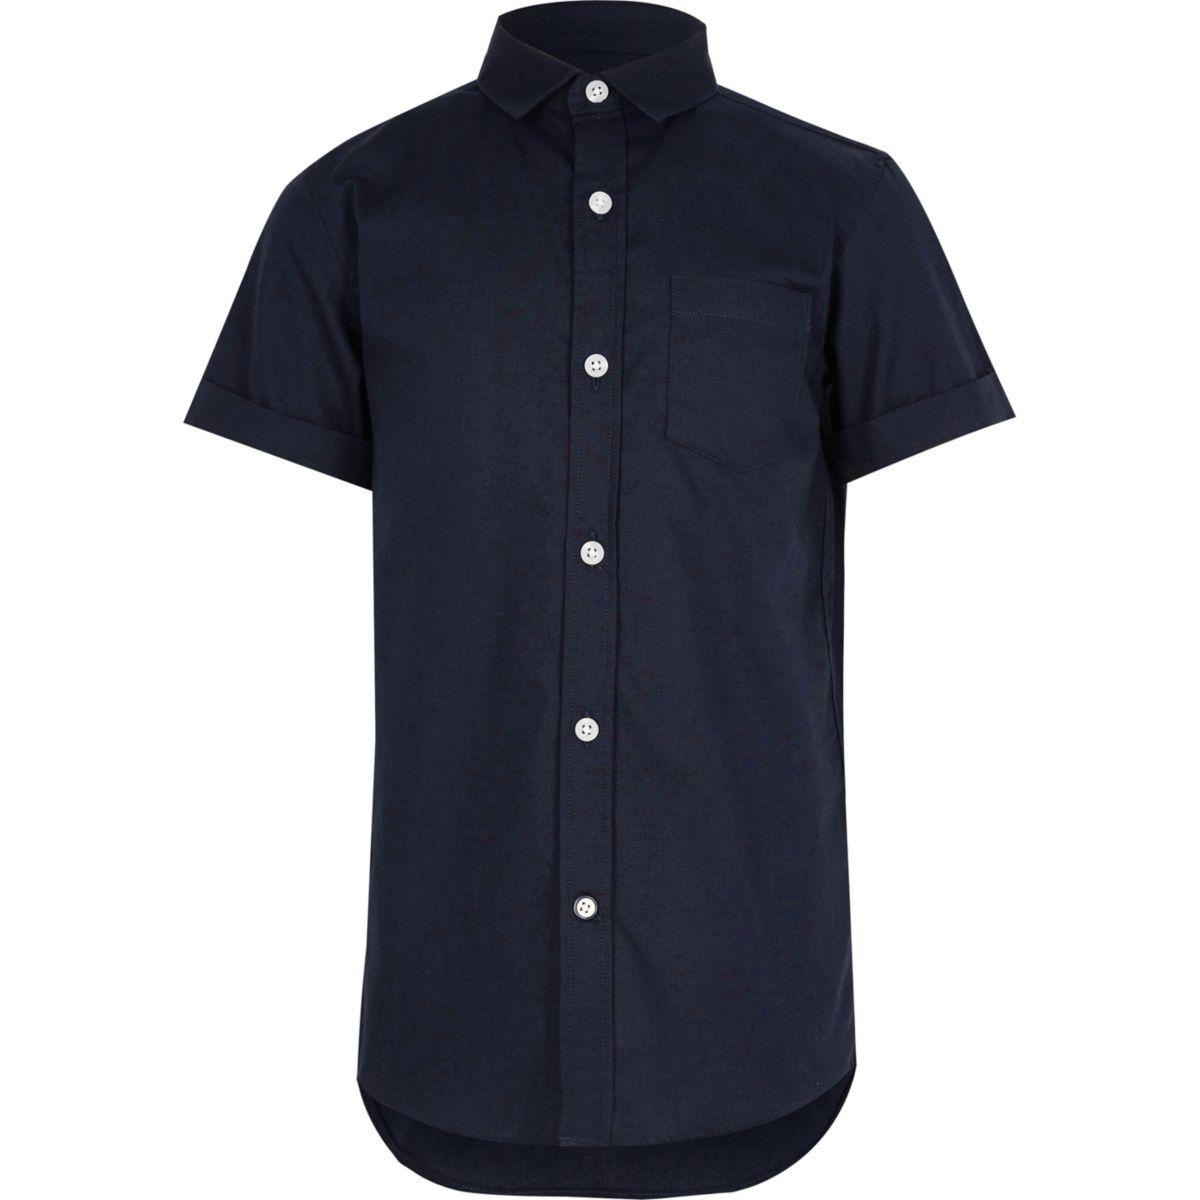 Boys navy short sleeve Oxford shirt